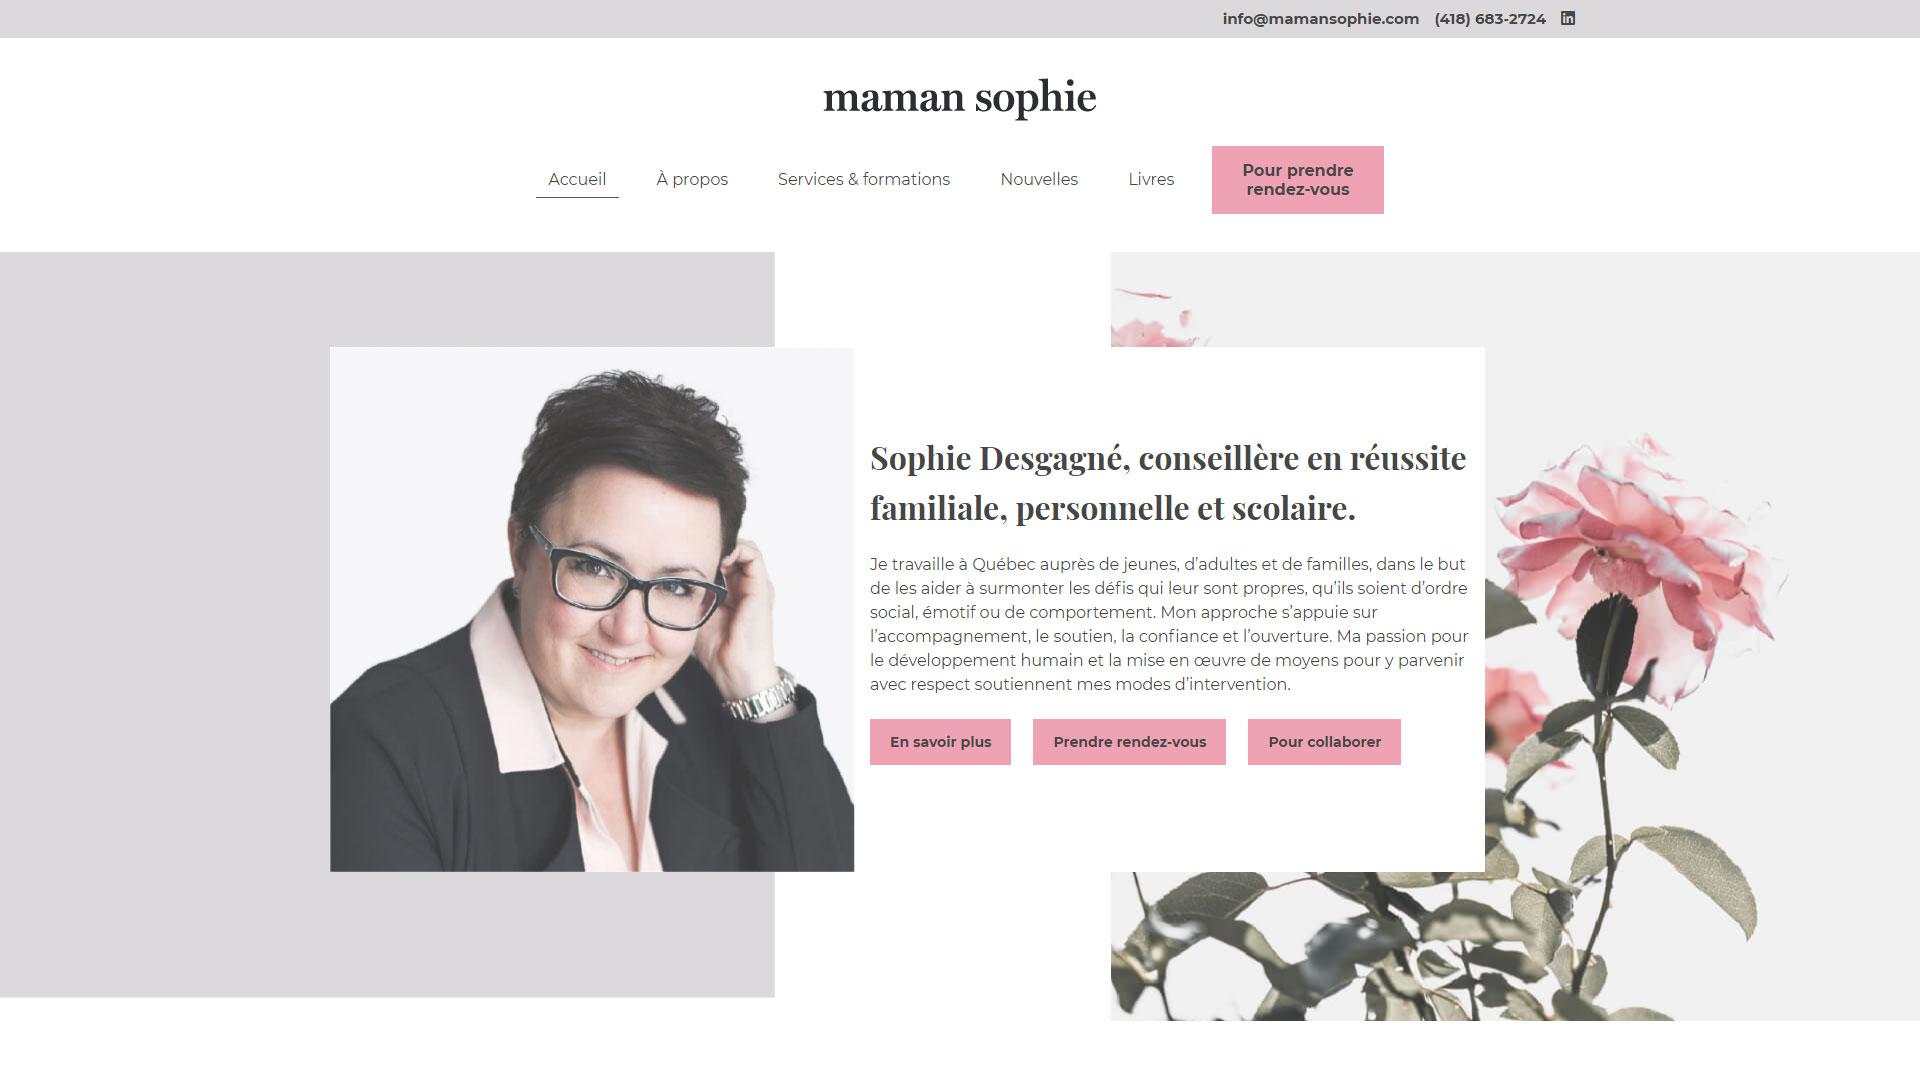 Maman Sophie